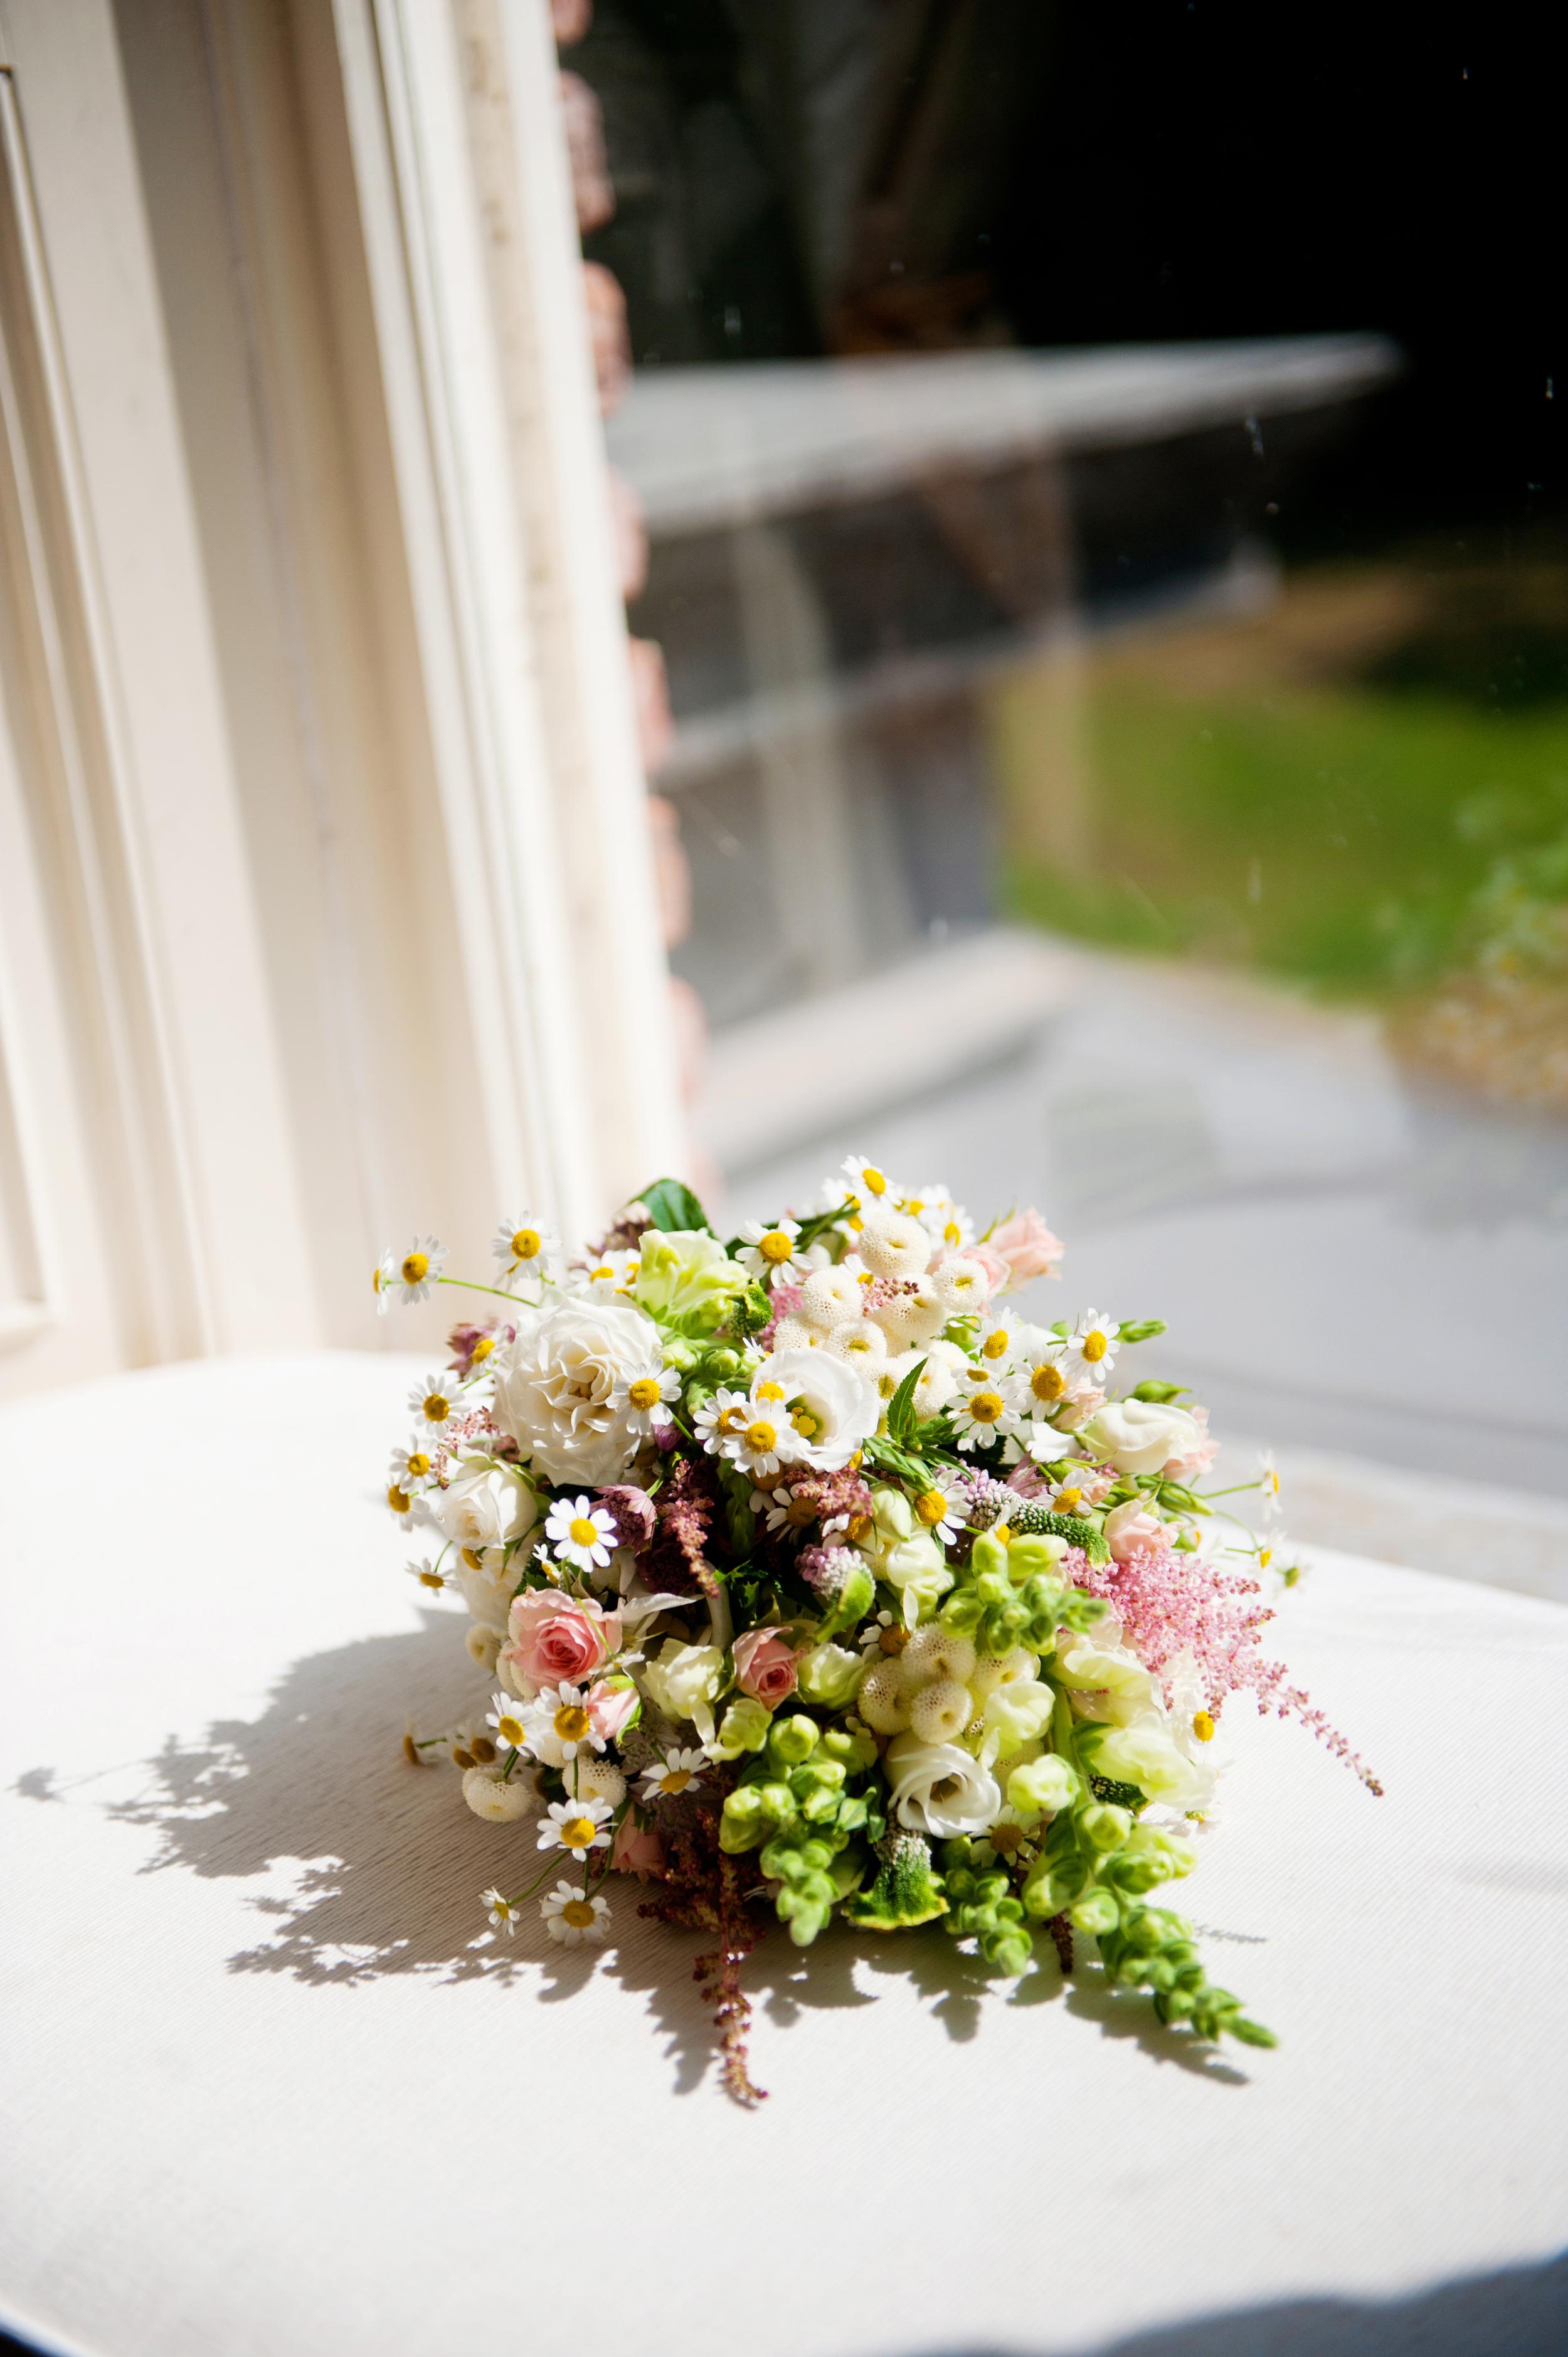 Flowers by Michelle of Cashel Flowers. -Photography:Weddings by KARA  © - Wedding Location: Kilshane House, Tipperary, Ireland